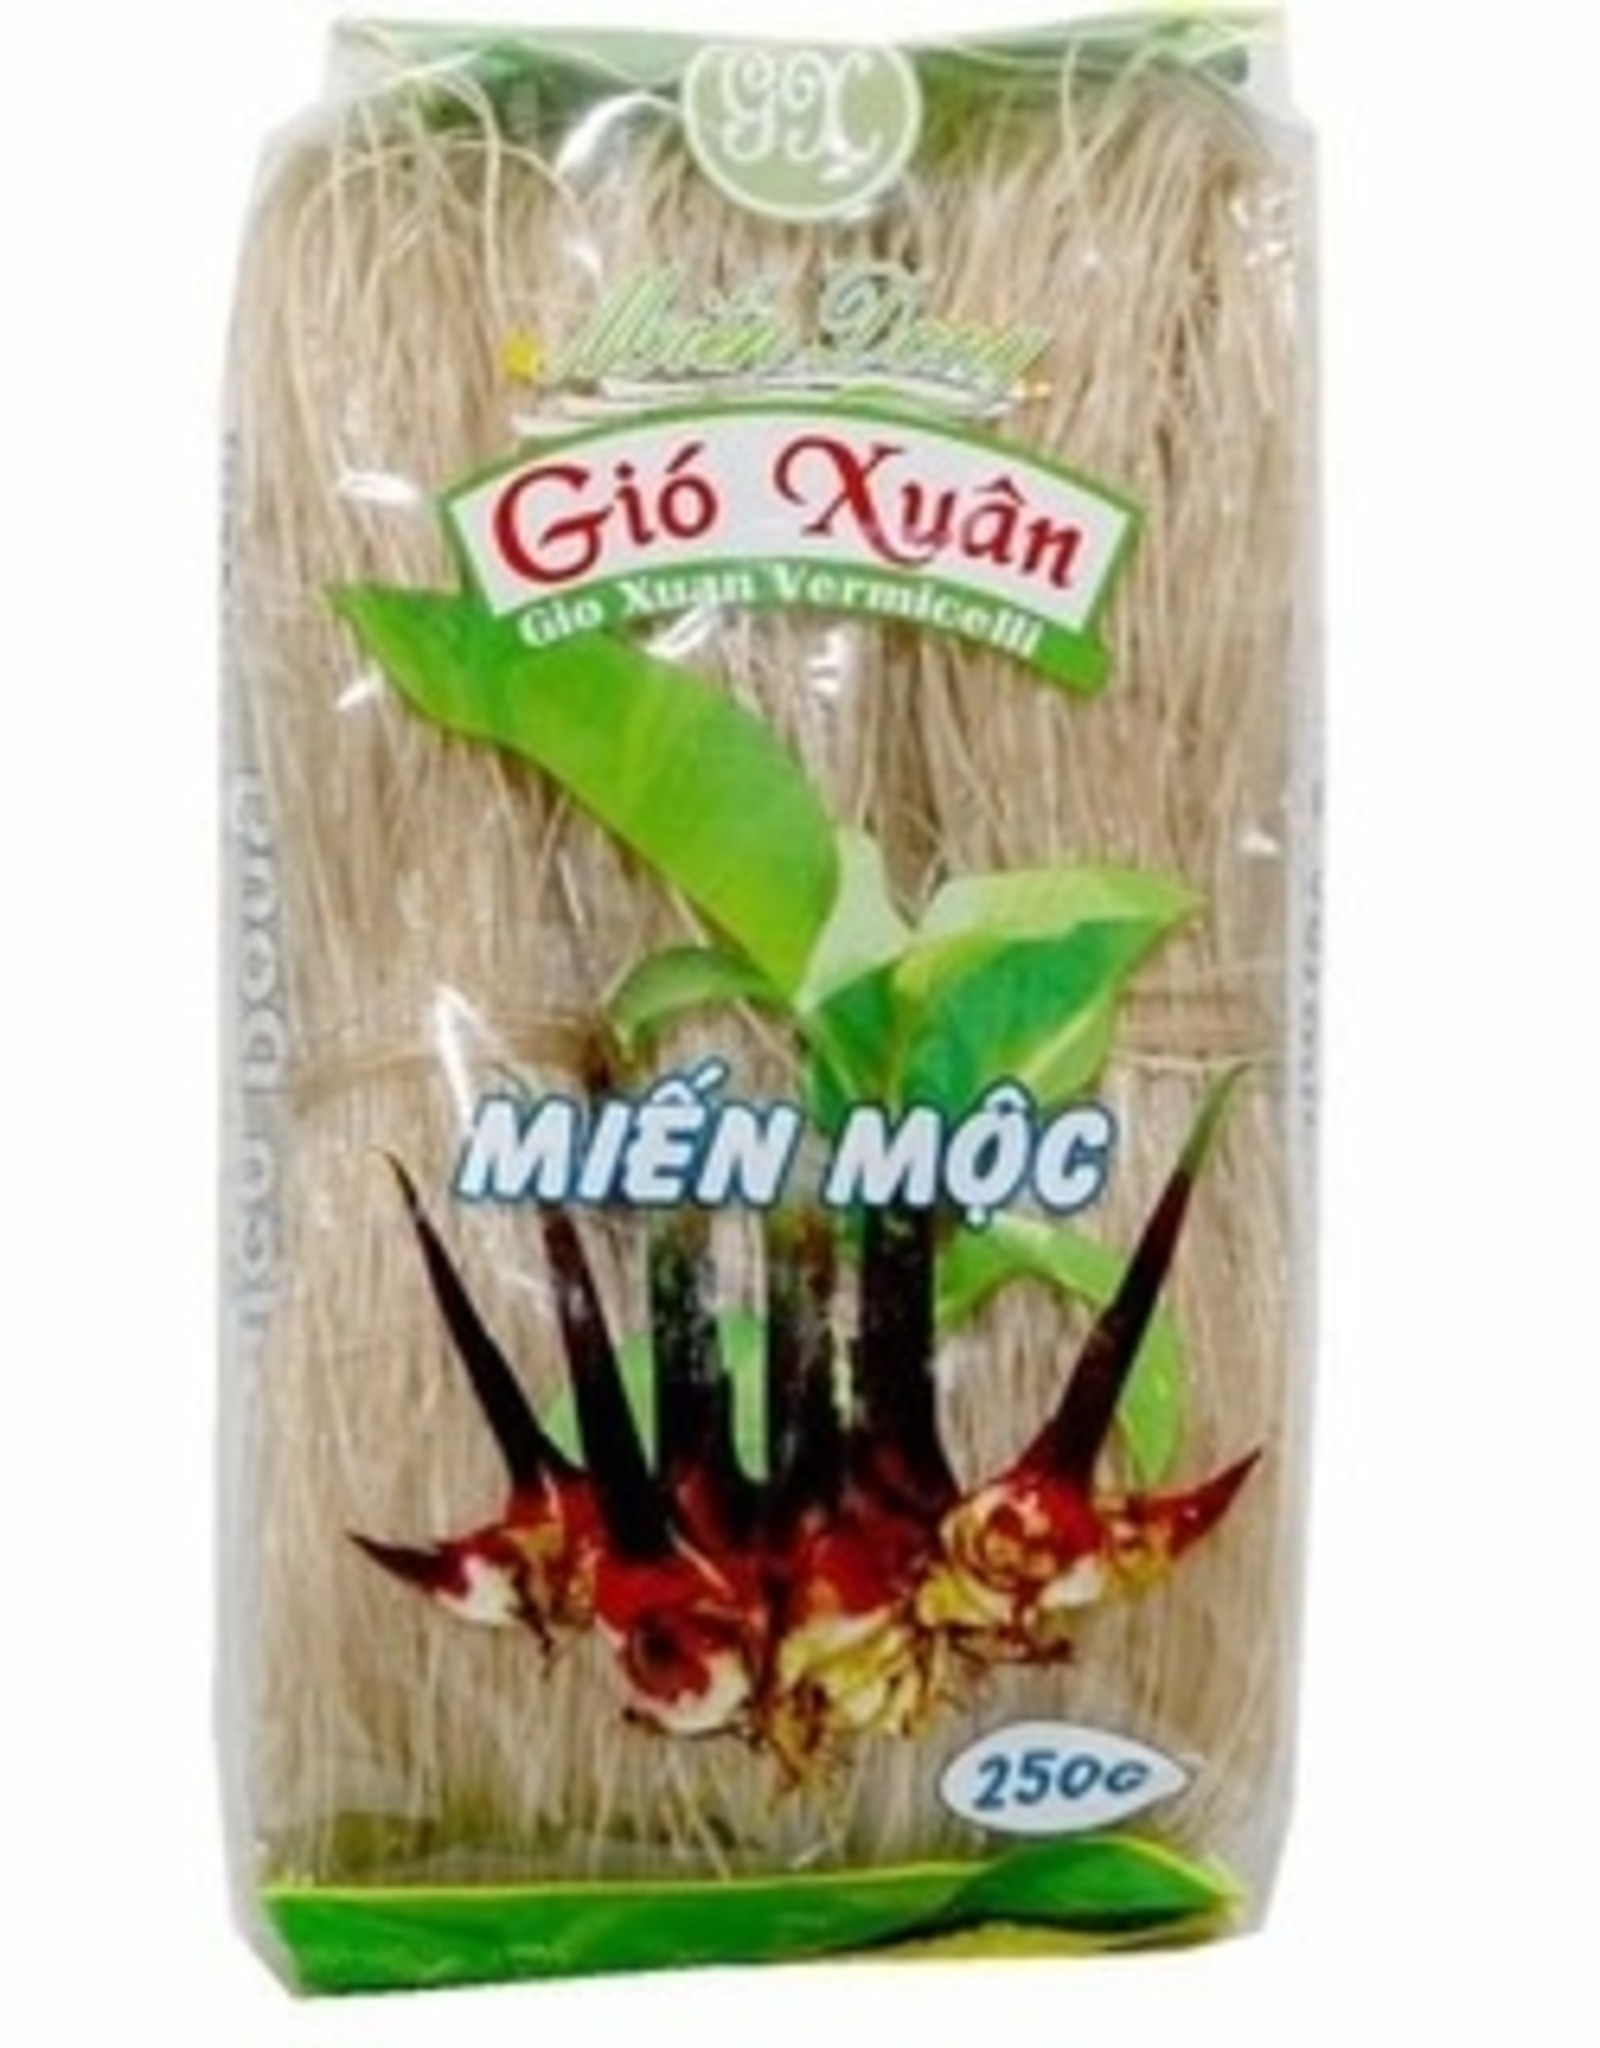 Glazen Noedel Gio Xuan 250G